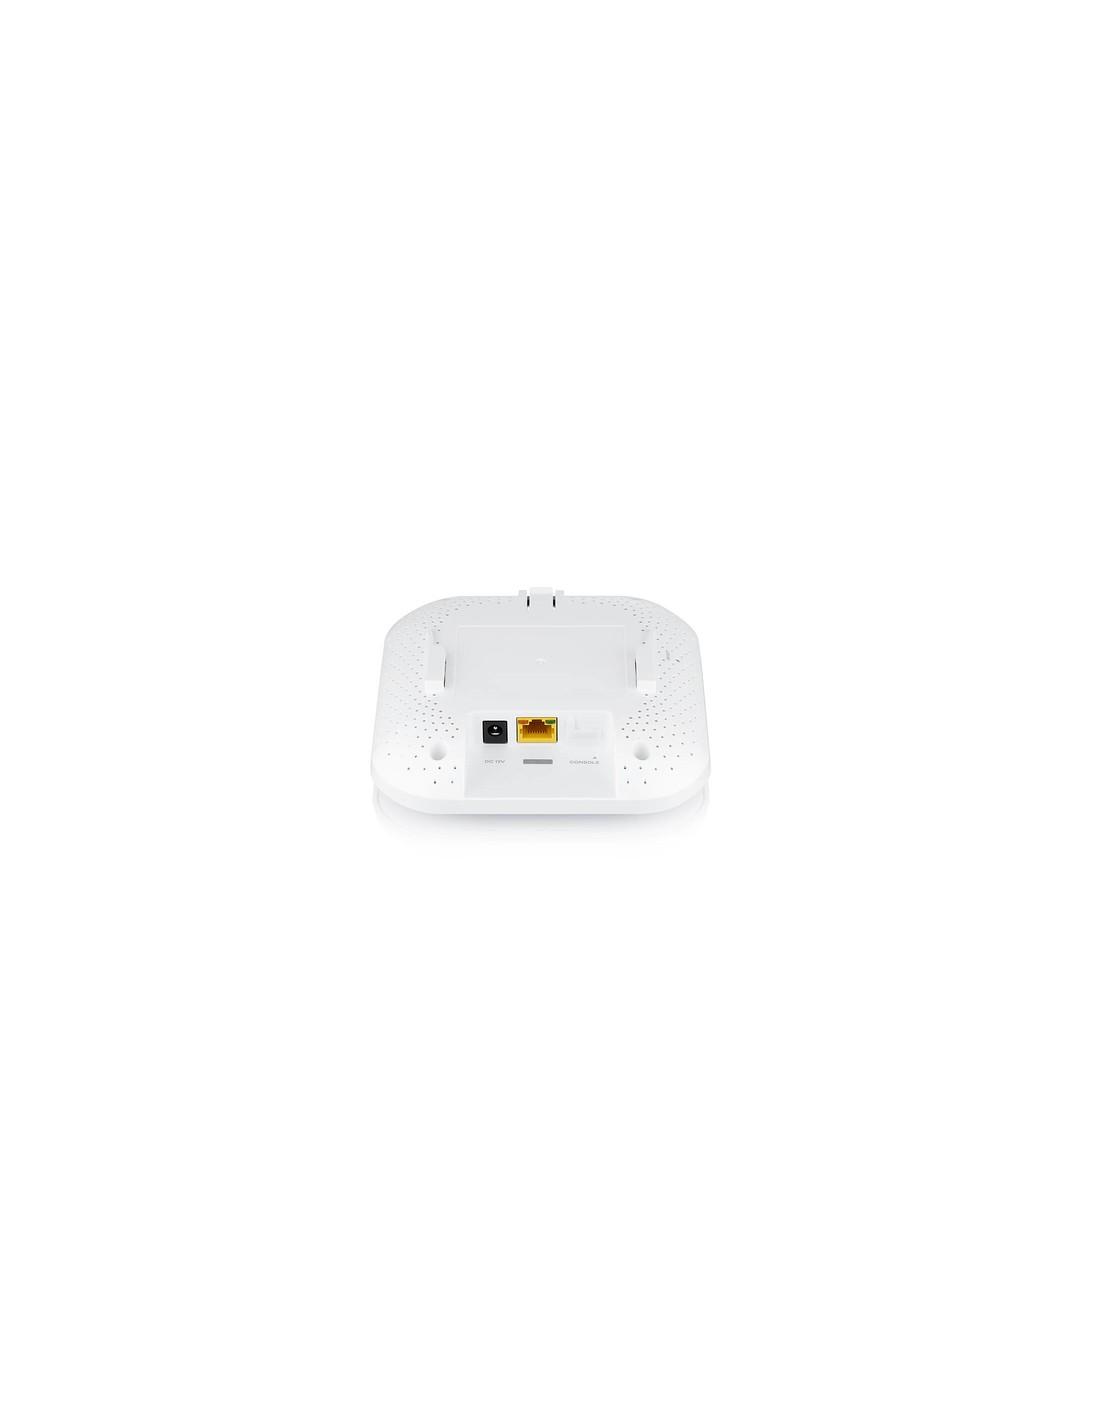 ONT ZyXEL GPON 4-port GbE LAN, 2-port USB, 2-port FXS, 802.11 B/G/N 2x2 300Mbps